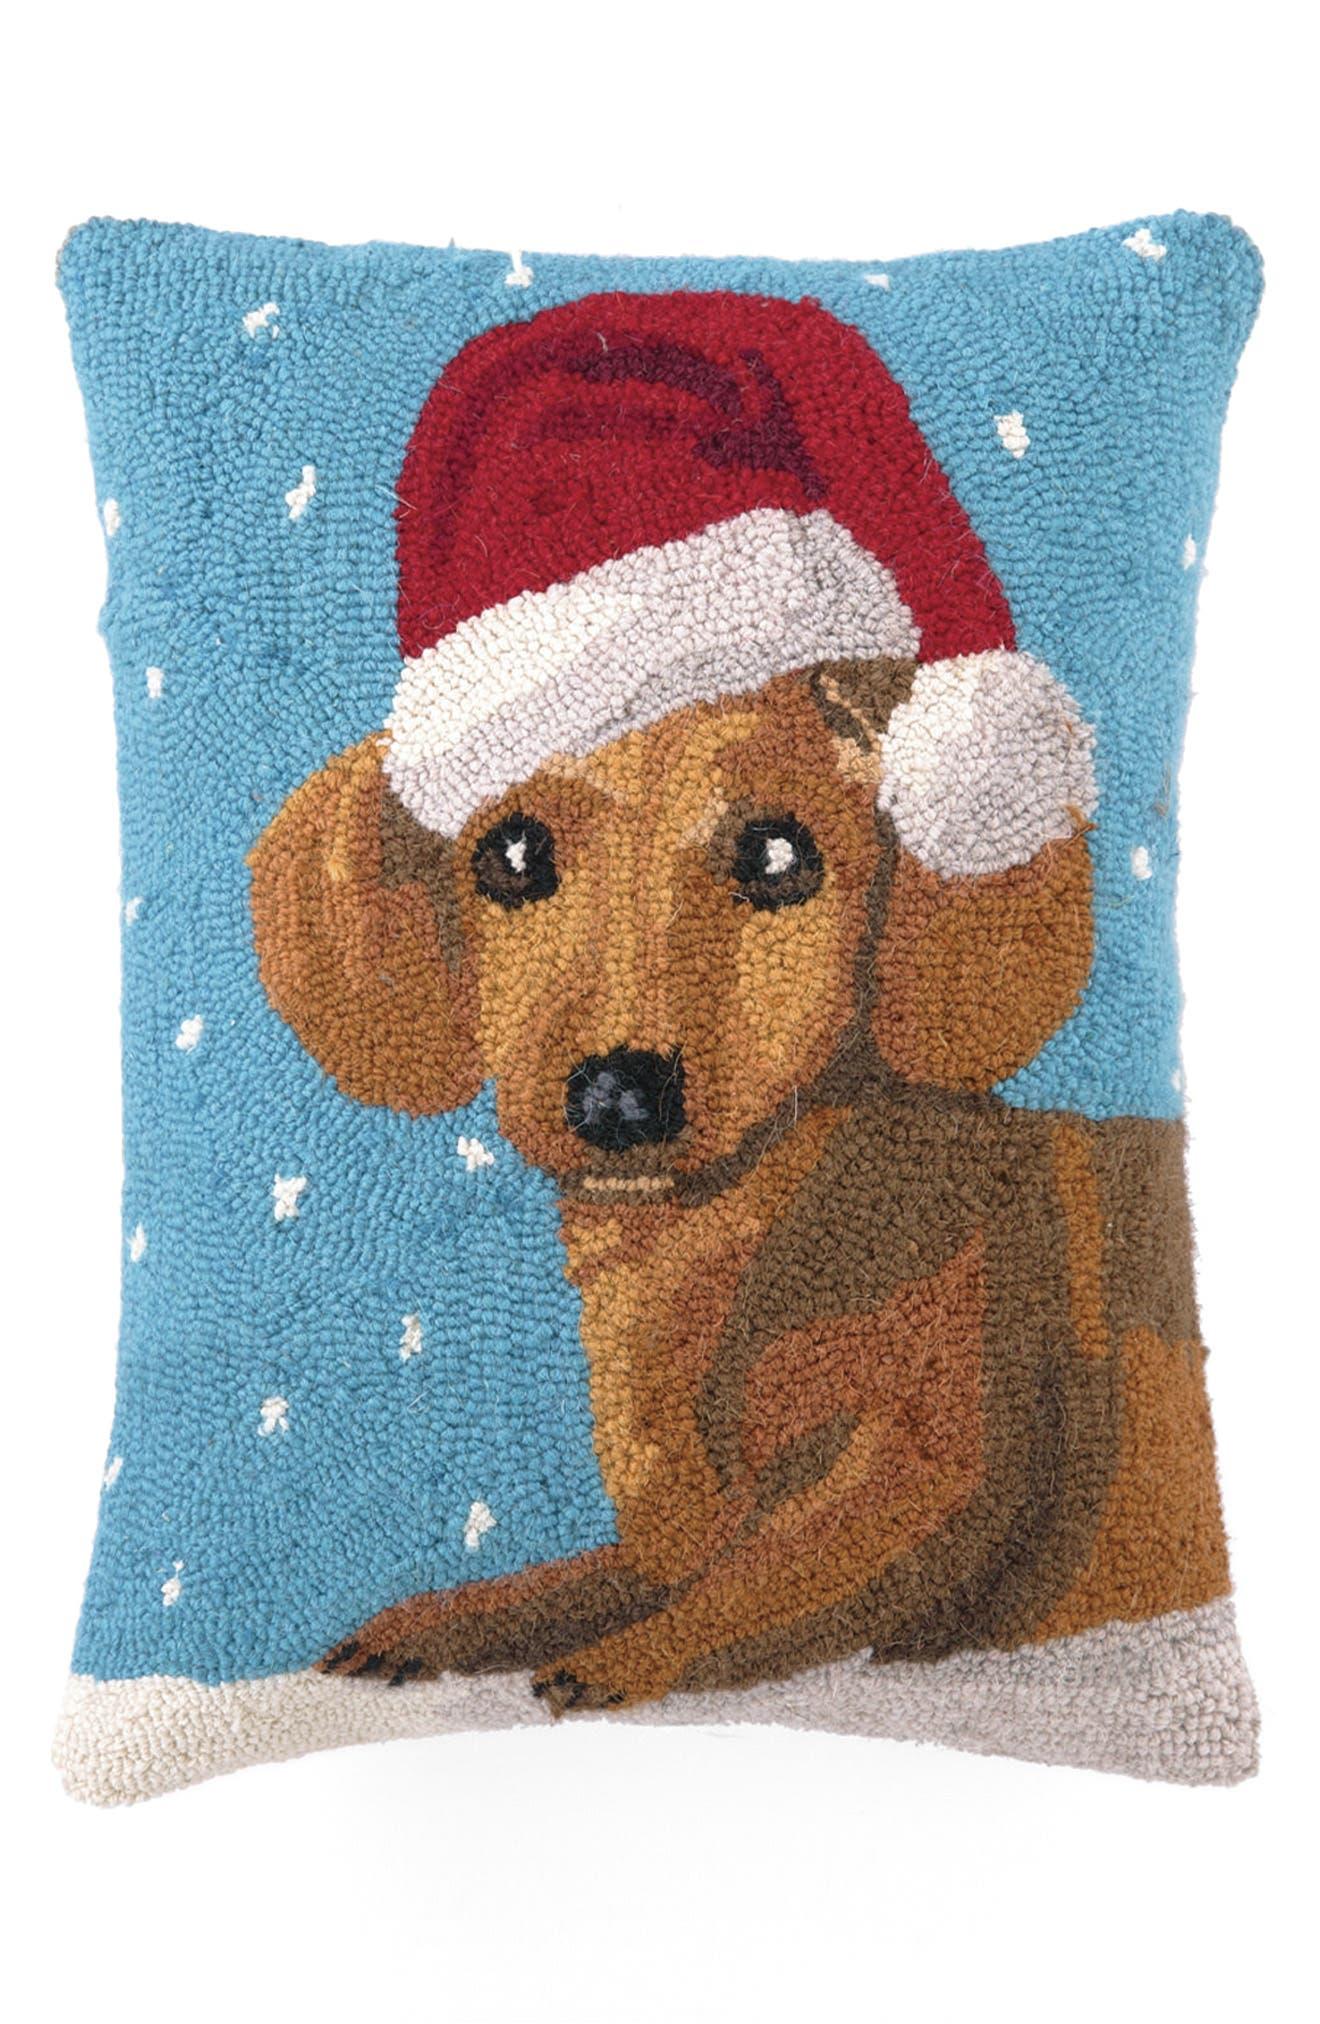 Peking Handicraft Christmas Dachshund Hooked Accent Pillow